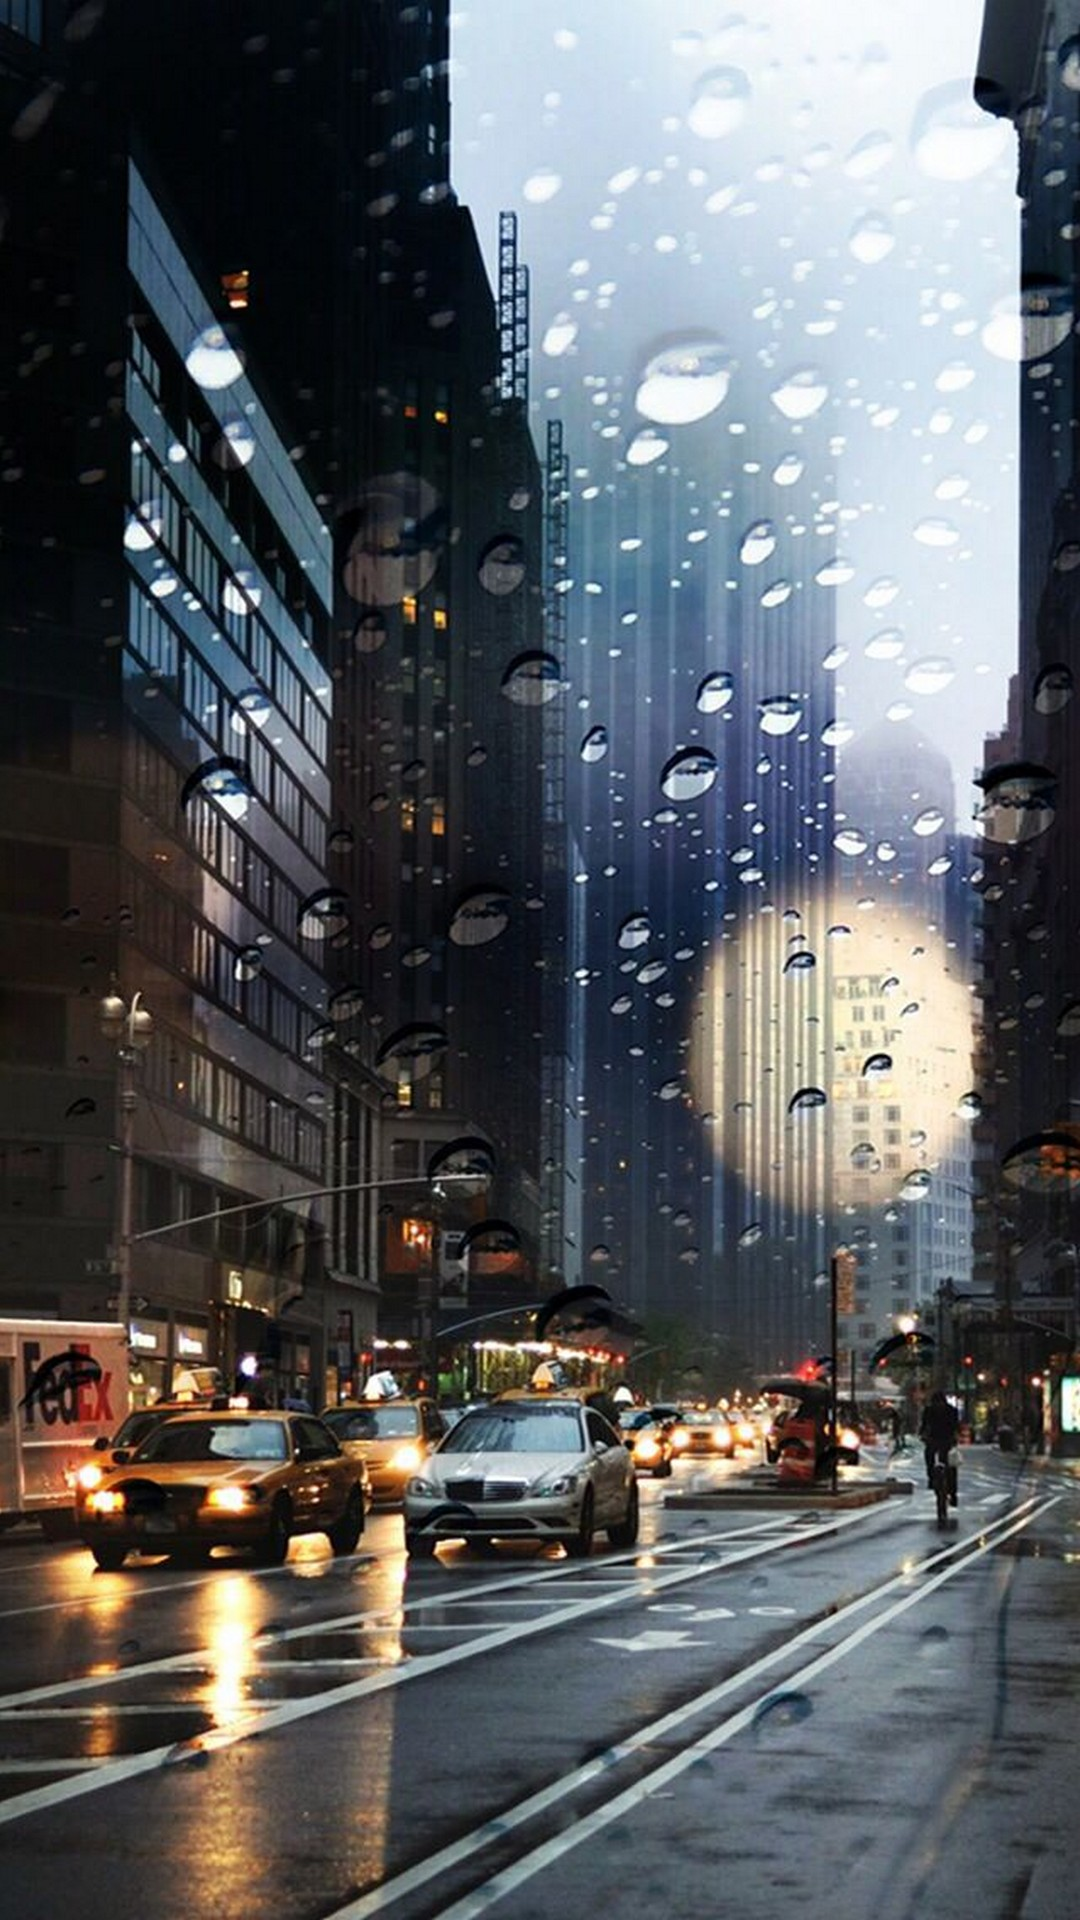 Gloomy Fall Wallpaper City Rain Iphone Wallpaper 2018 Iphone Wallpapers